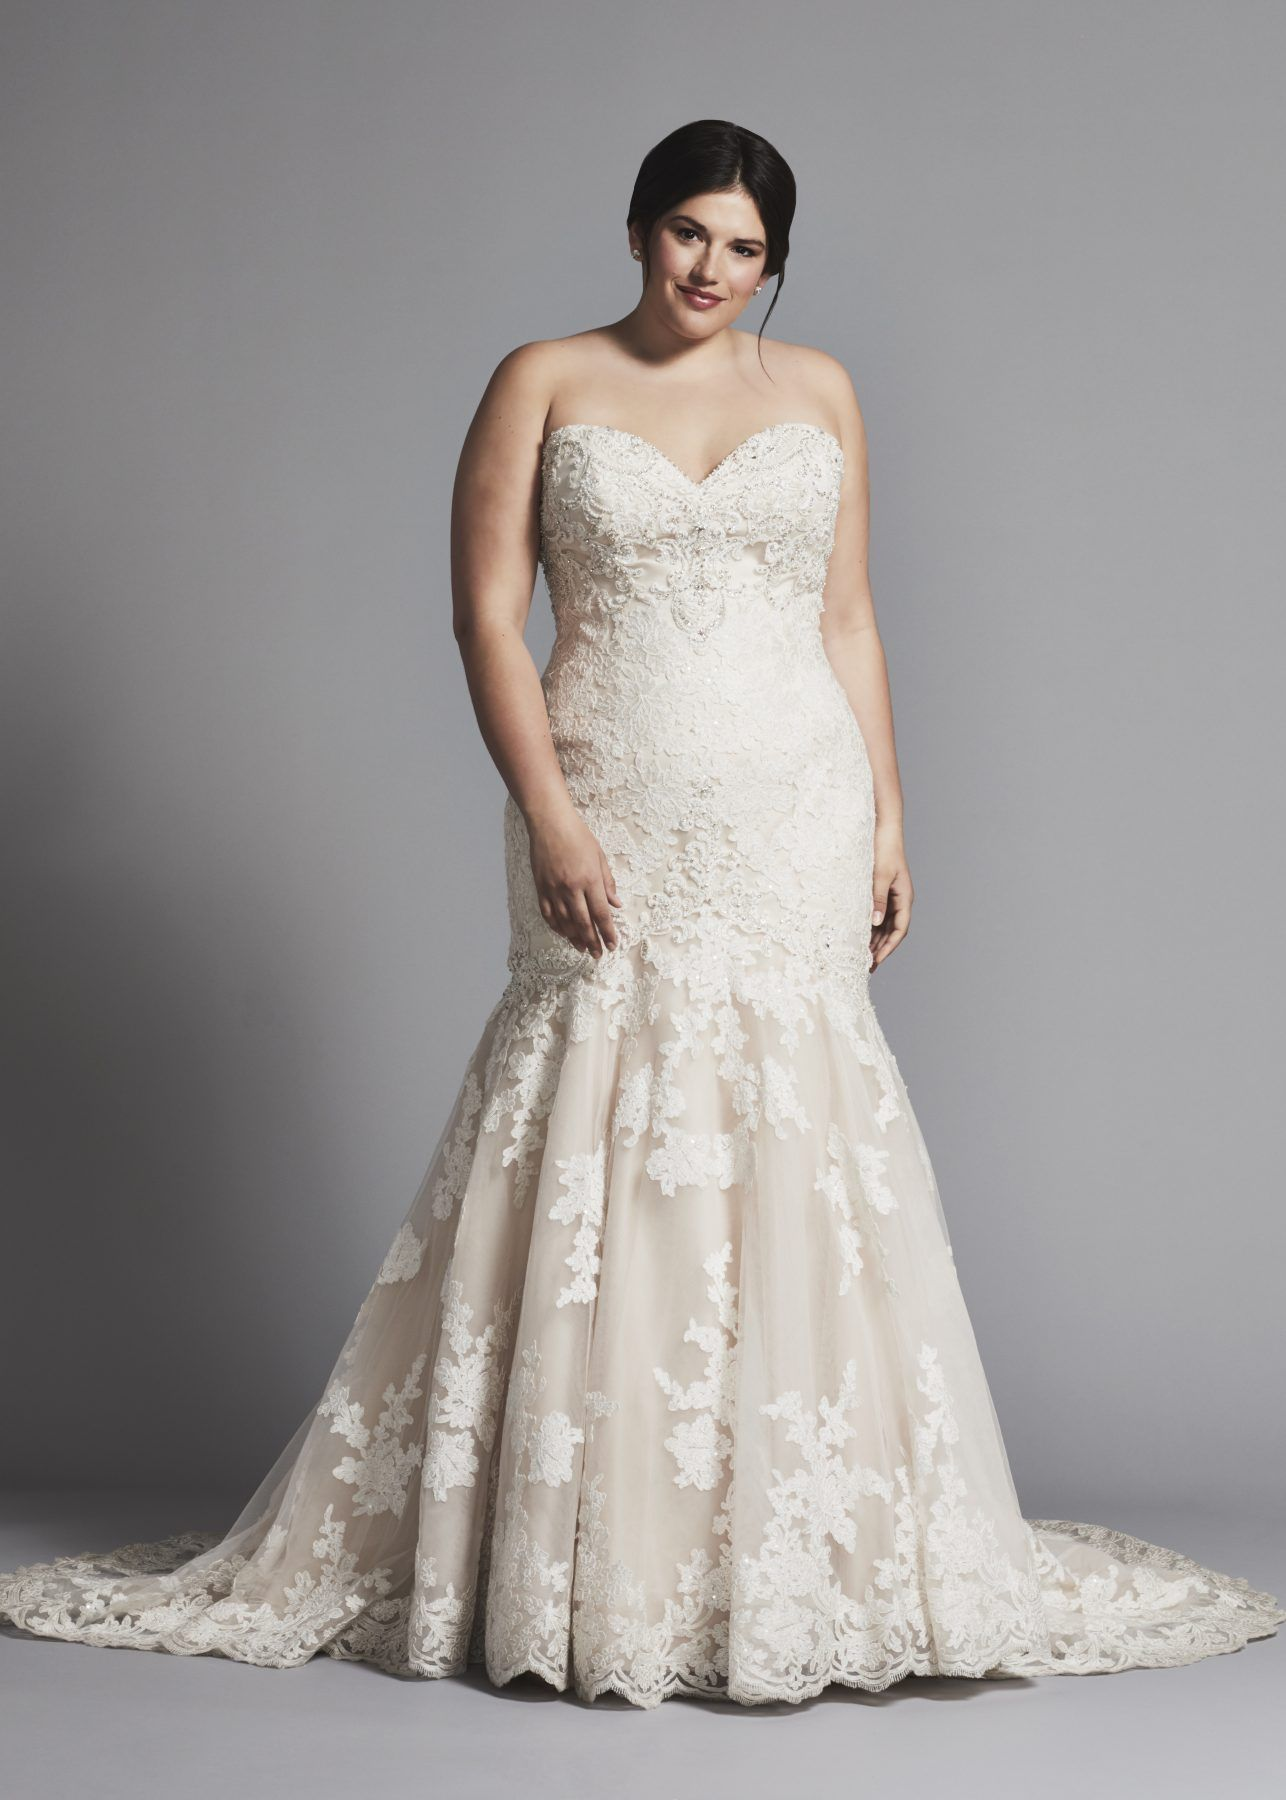 Strapless Lace Mermaid Wedding Dress Lace Mermaid Wedding Dress